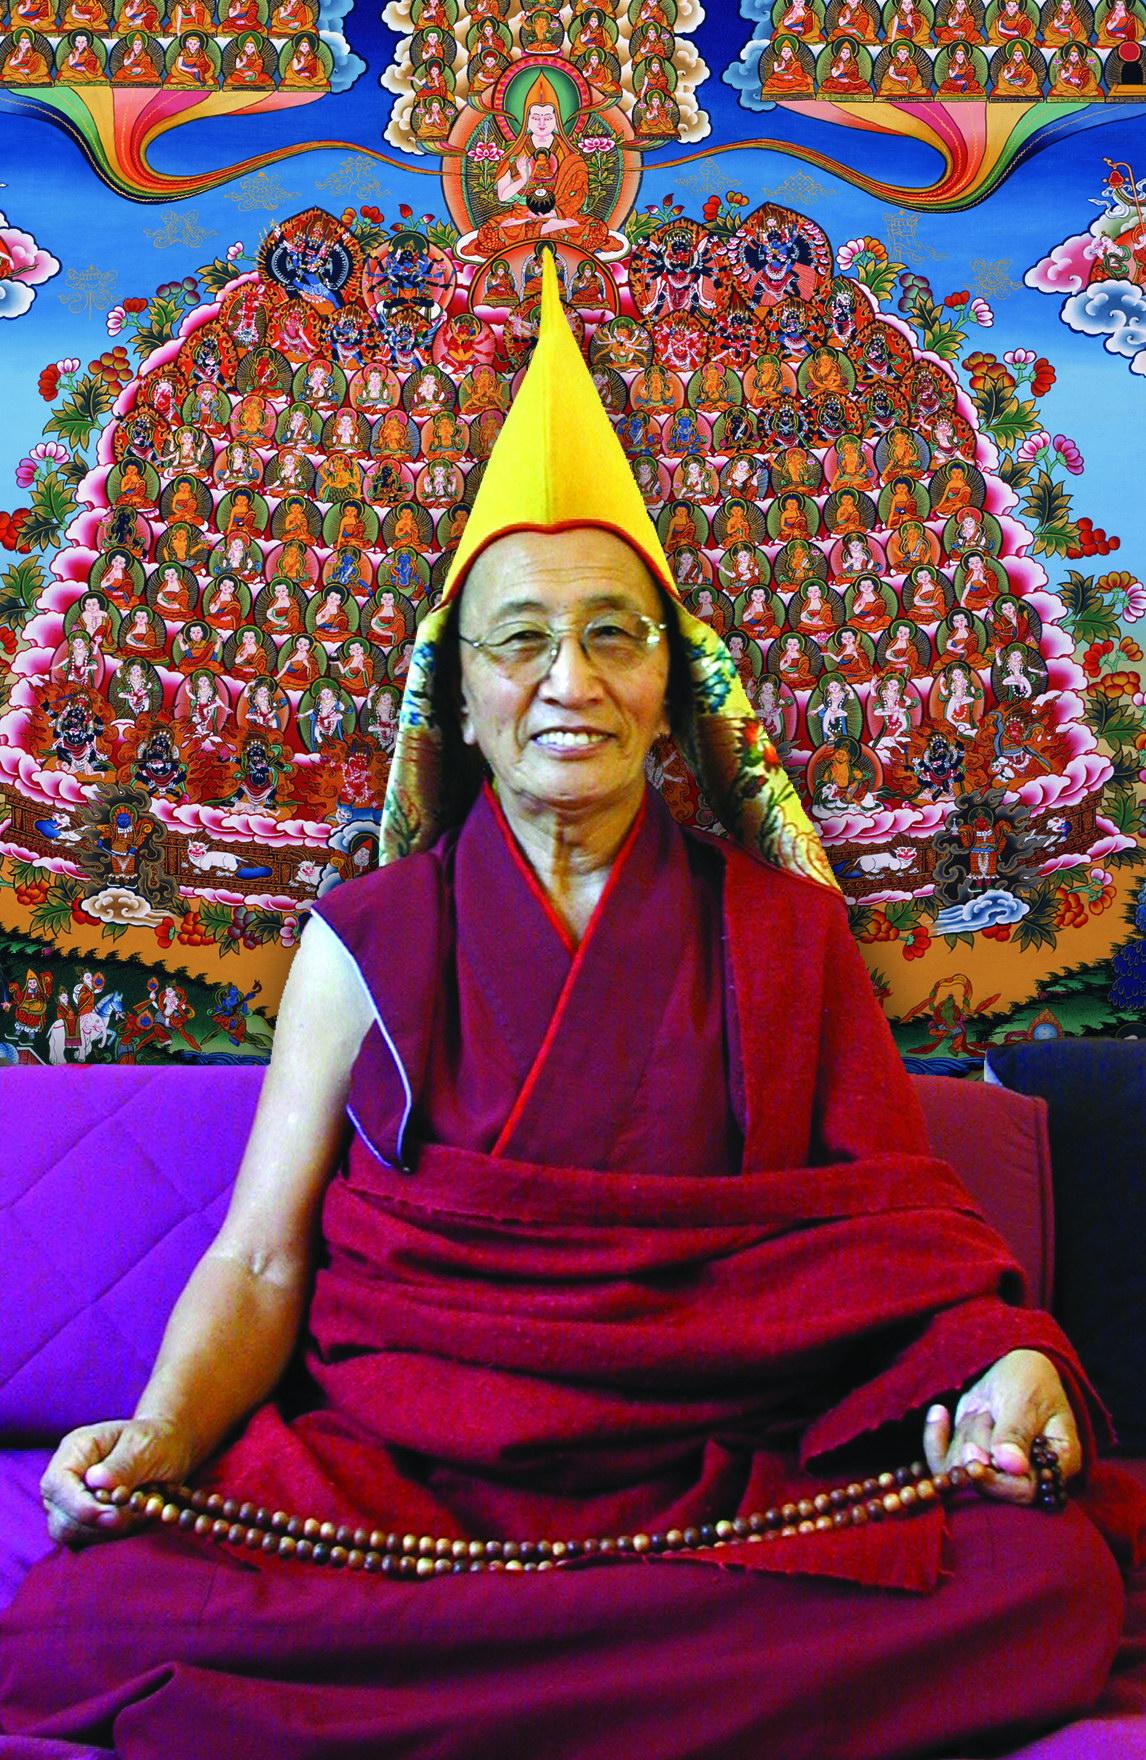 Ven. Ghesce Kirti Tsenshab Rinpoche